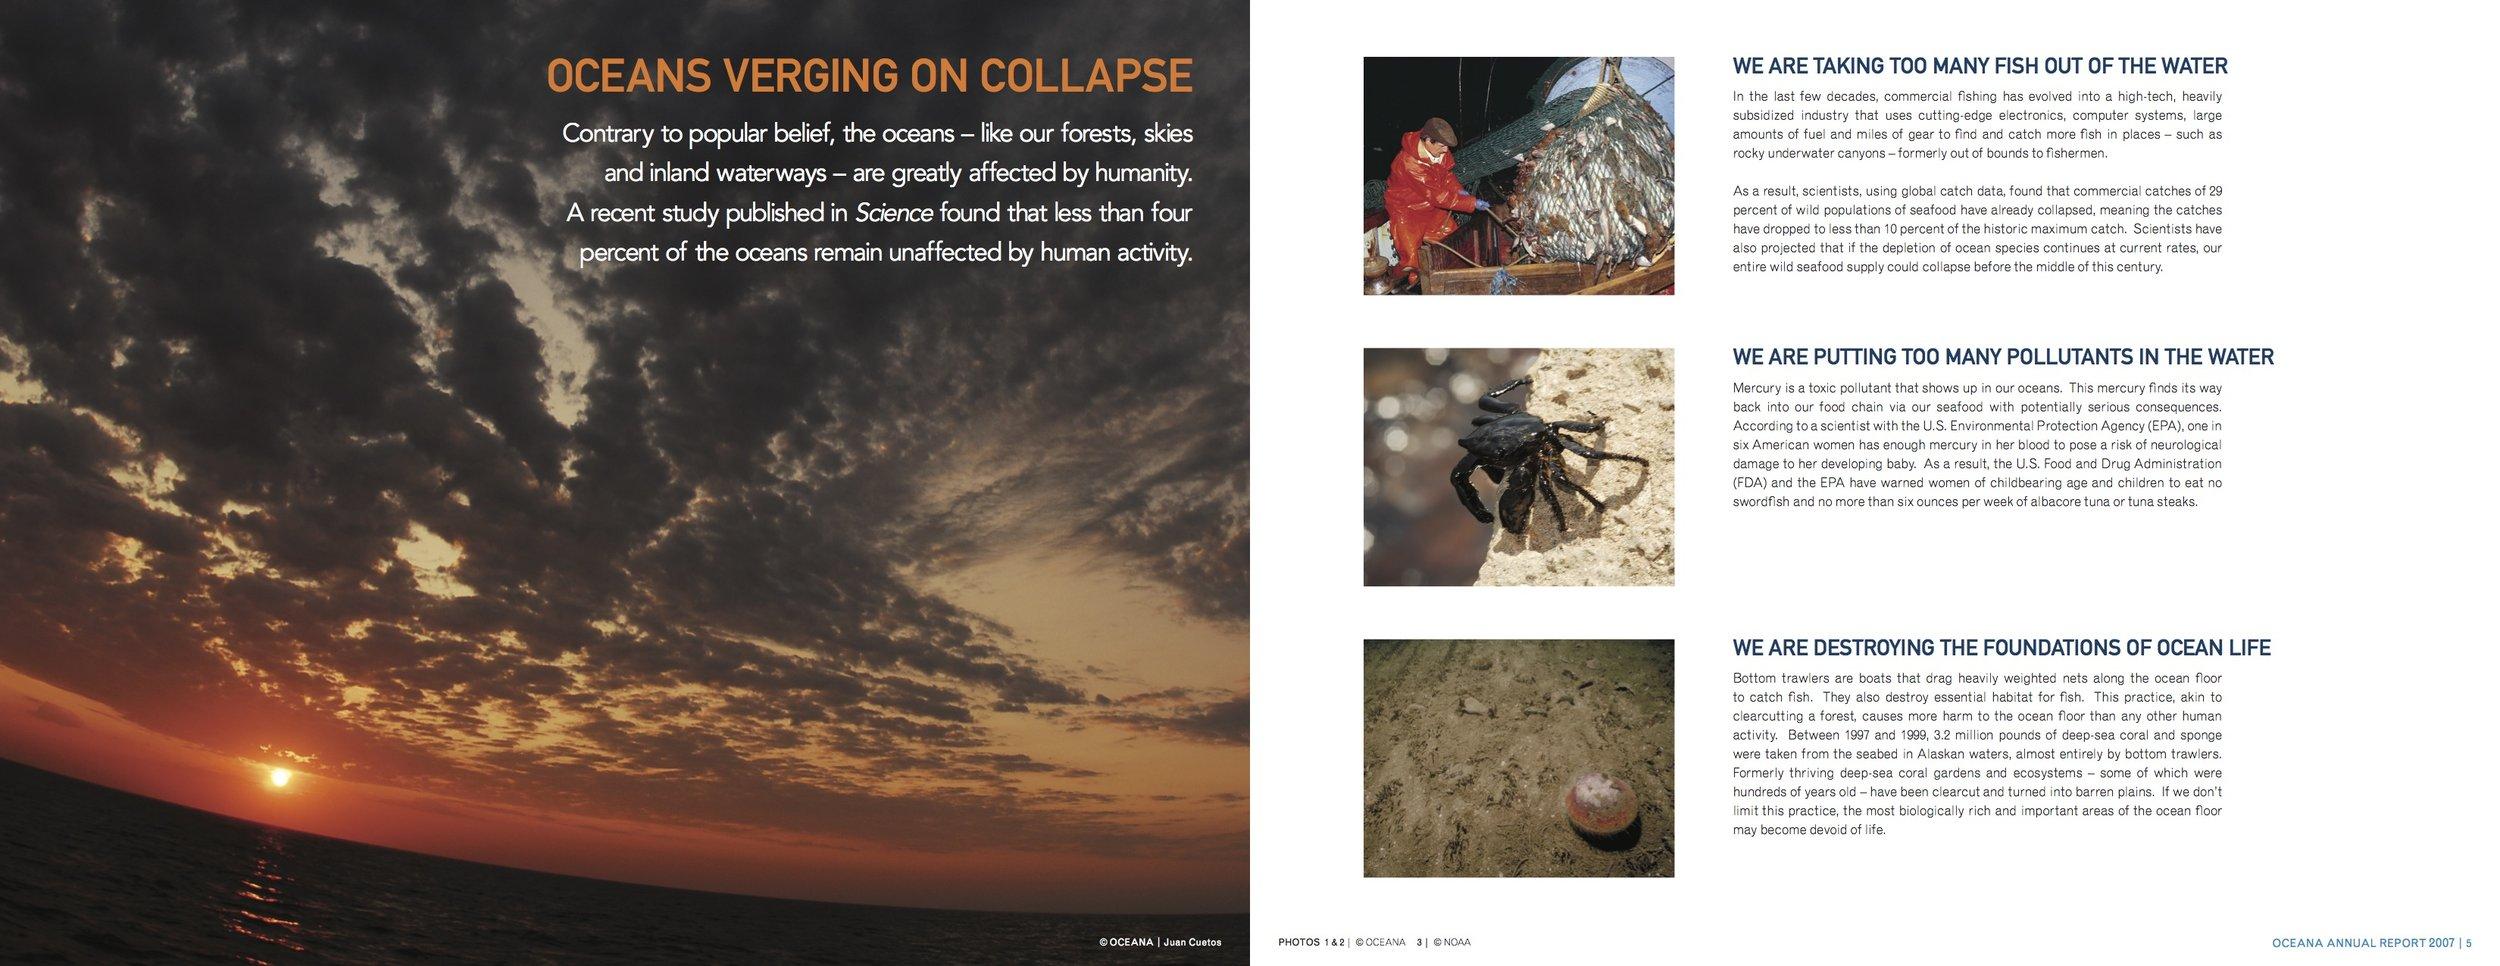 Oceana_annual_report07_FINAL3.jpg